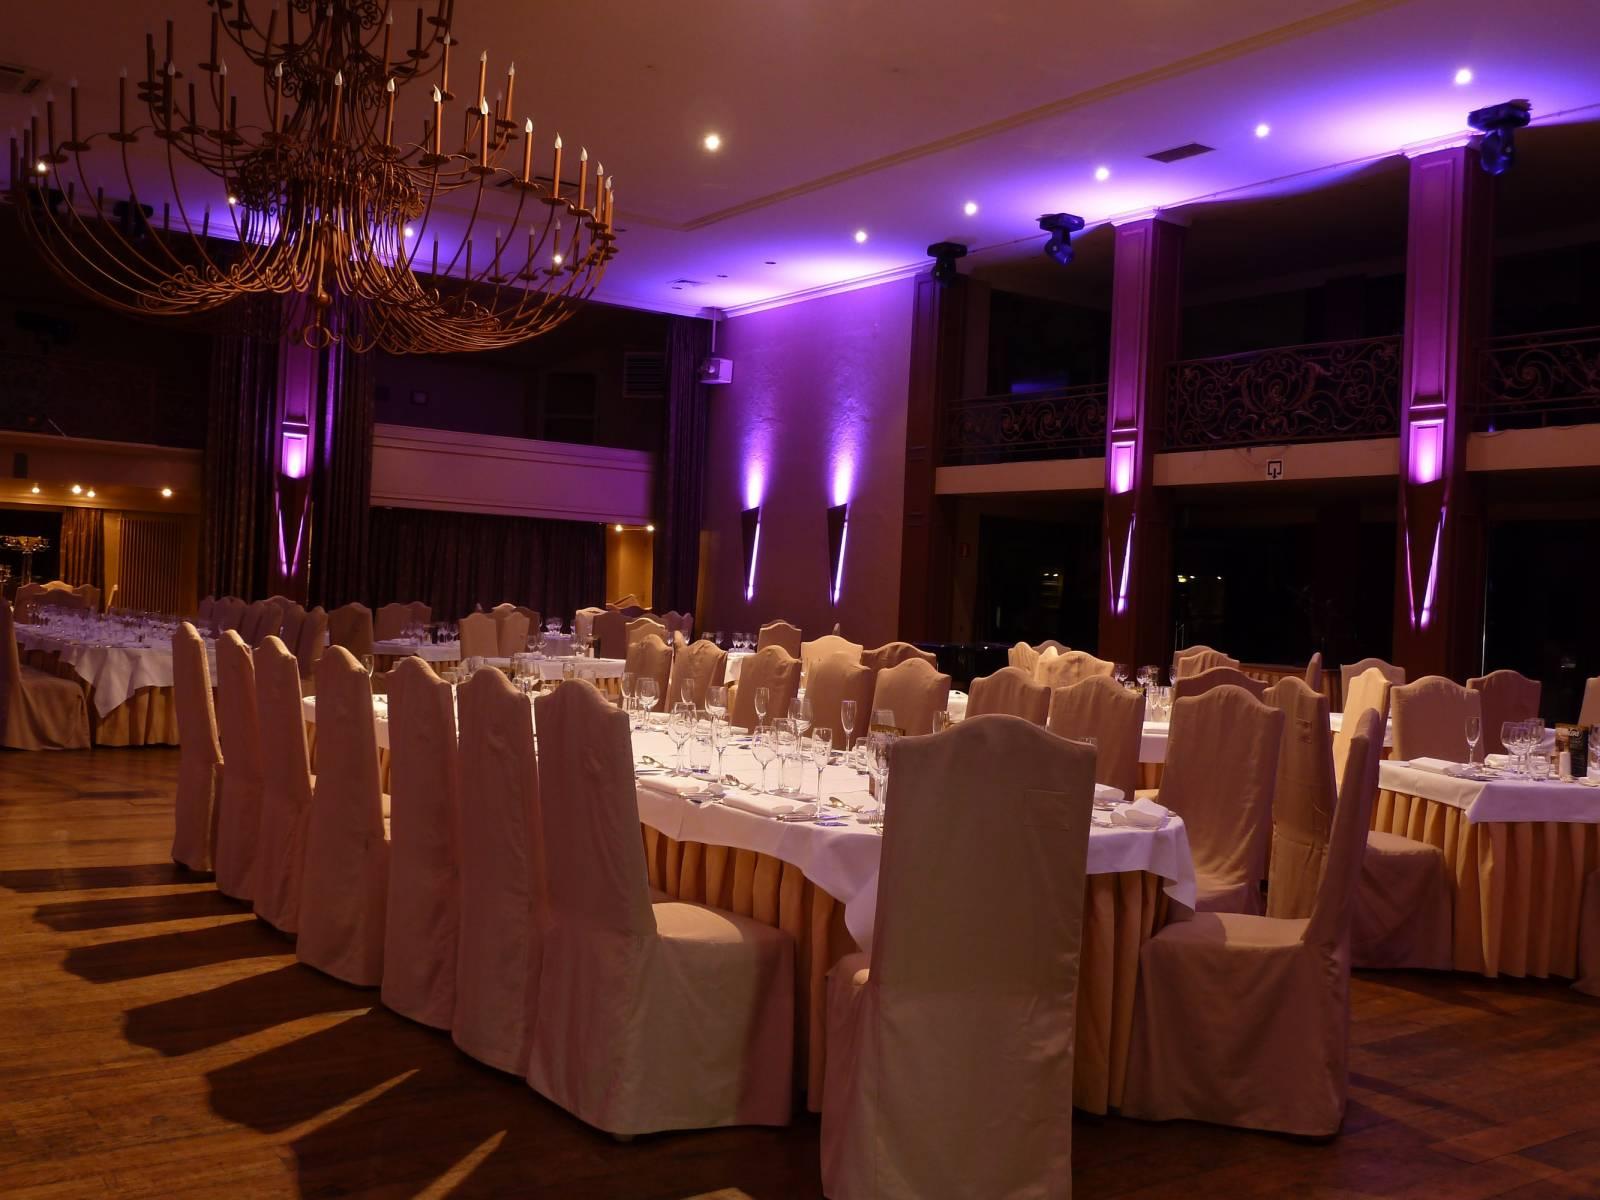 Cortina Wevelgem - Feestzaal - House of Weddings (10)